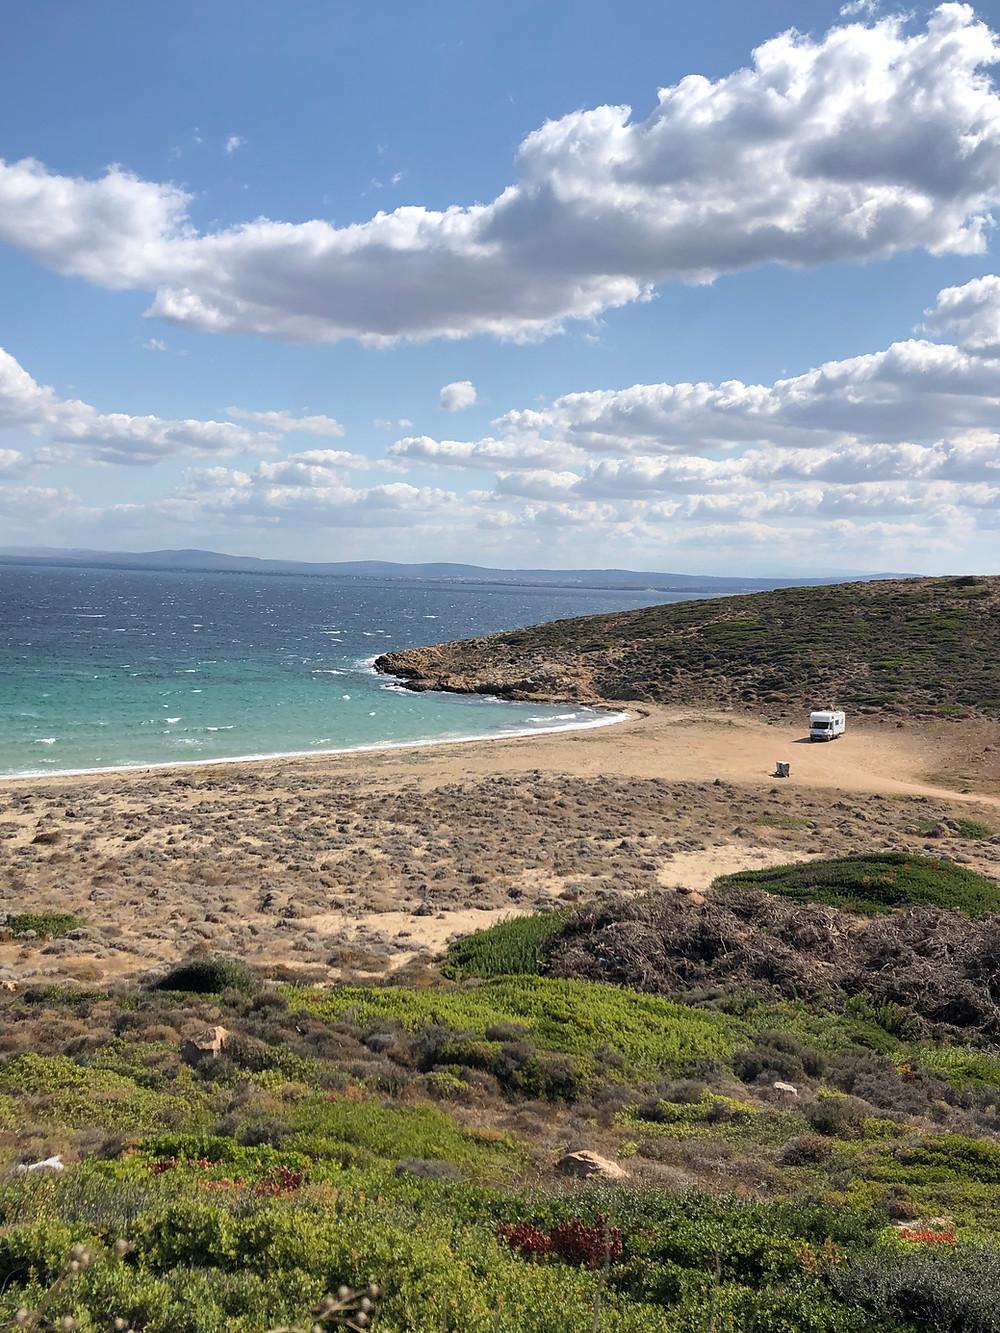 wild sandy beach on Bozcaada island in Turkey